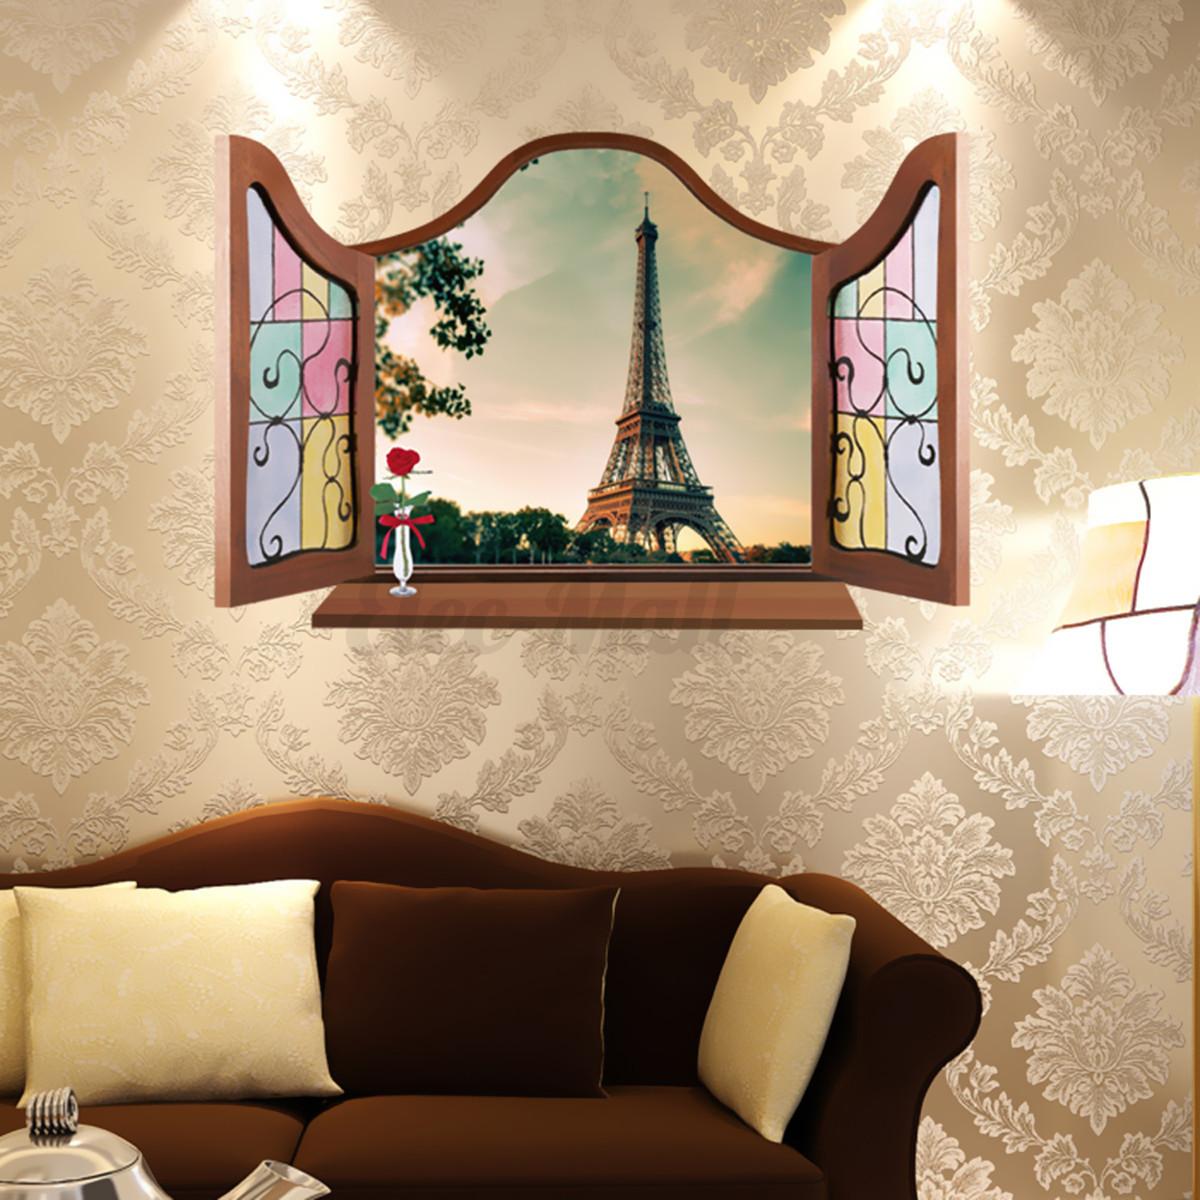 Removable paris eiffel tower window art mural decal for Eiffel tower wall mural ikea